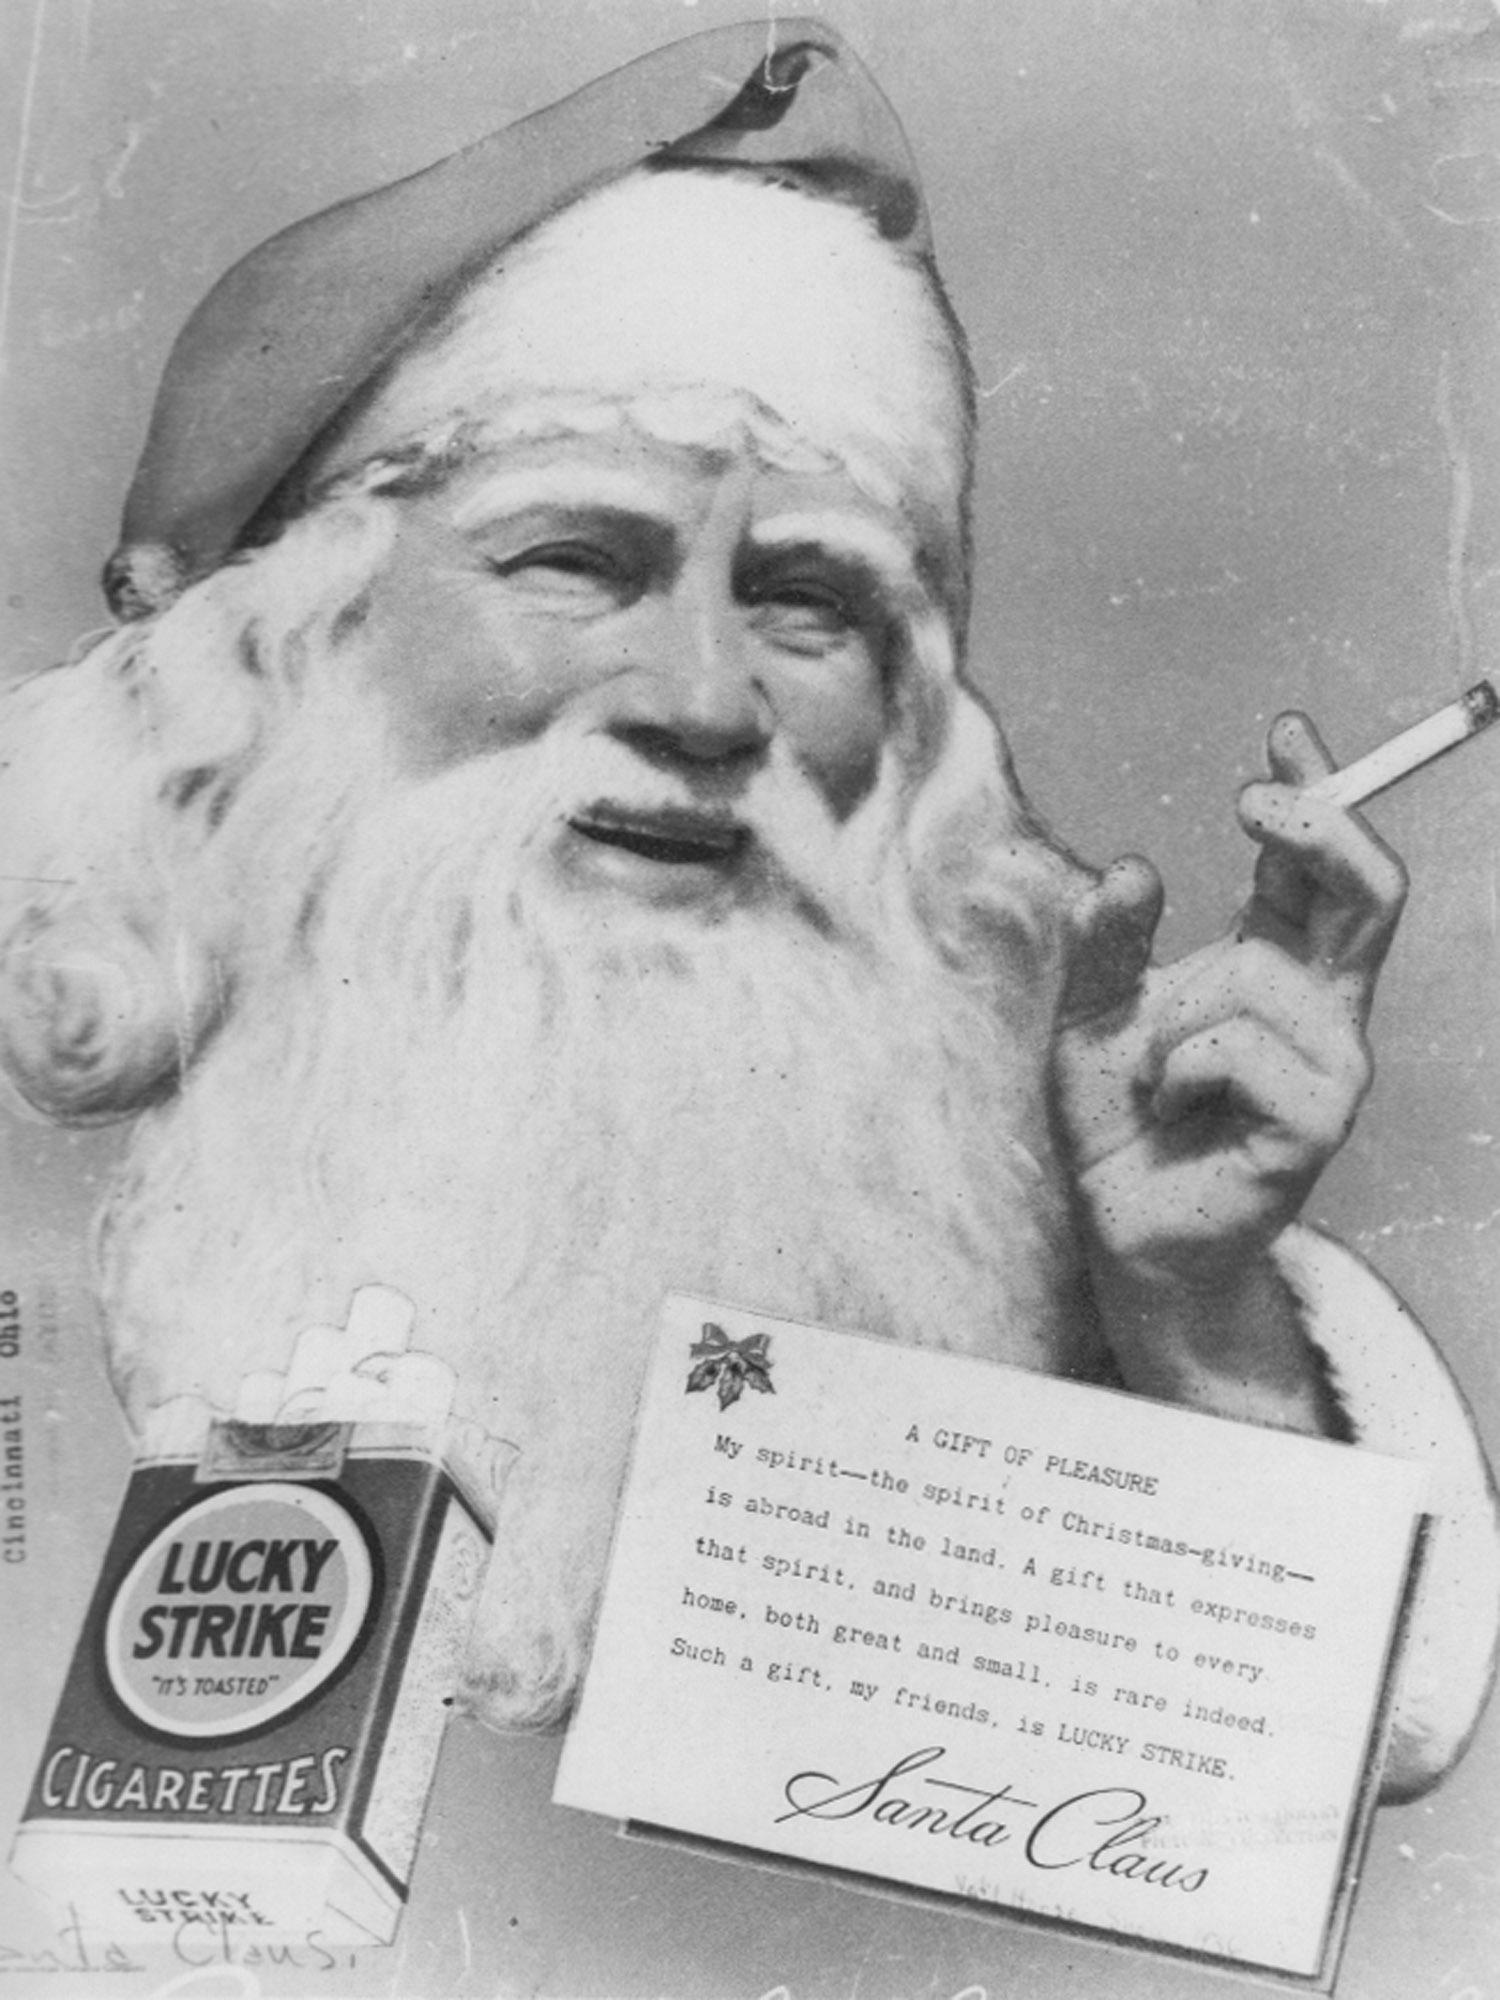 Luck Strike magazine advertisement, 1930s Photos Courtesy: National Archives